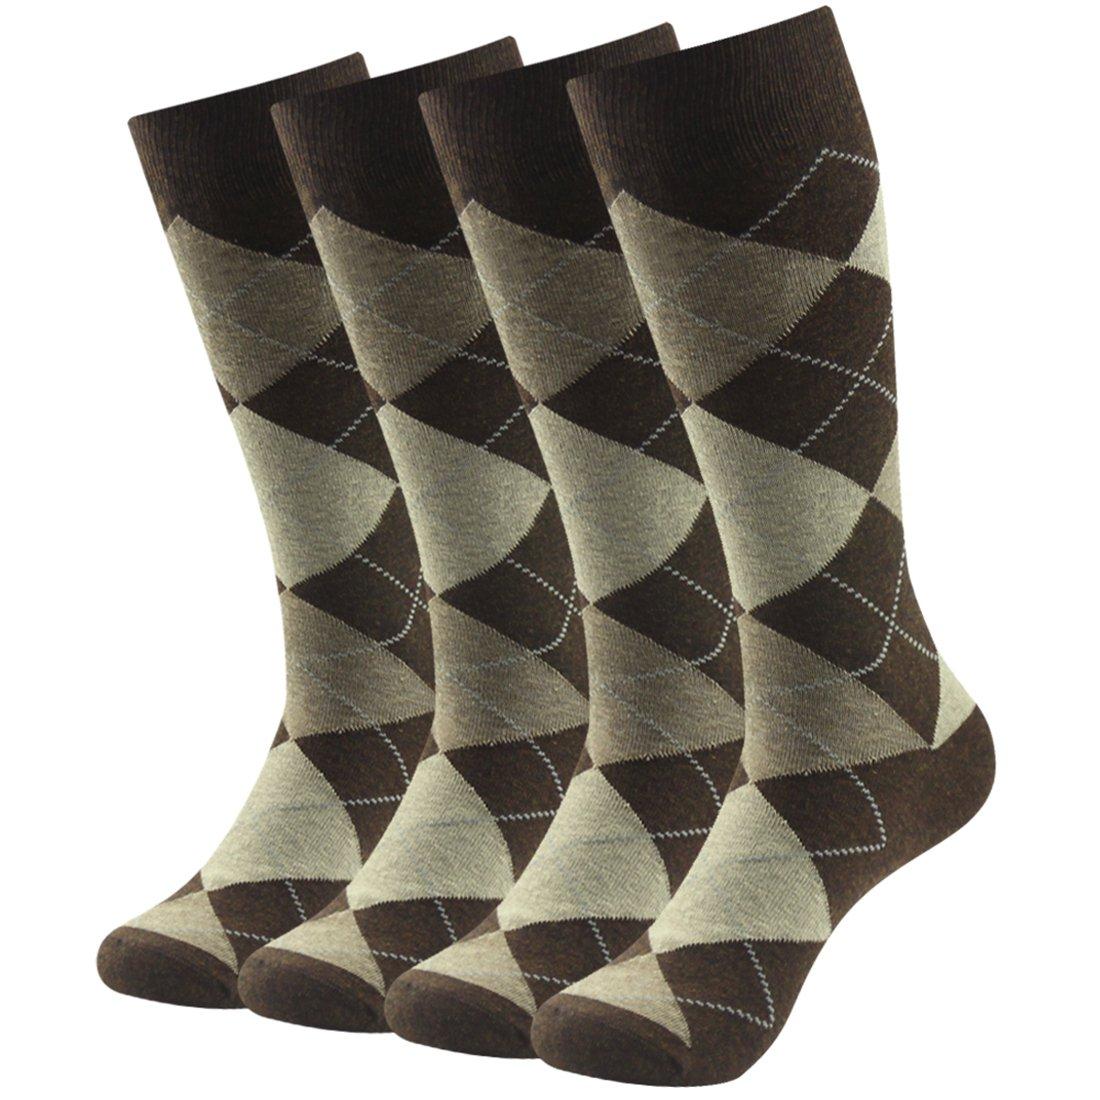 Business Suit Socks, SUTTOS Mens Fashion Argyle Dress Crew Socks,Jacquard Plaid Pattern Charged Cotton Blend Mid Calf Long Tube Crew Gift Dress Socks for Groomsmen Wedding Socks,4 Pairs